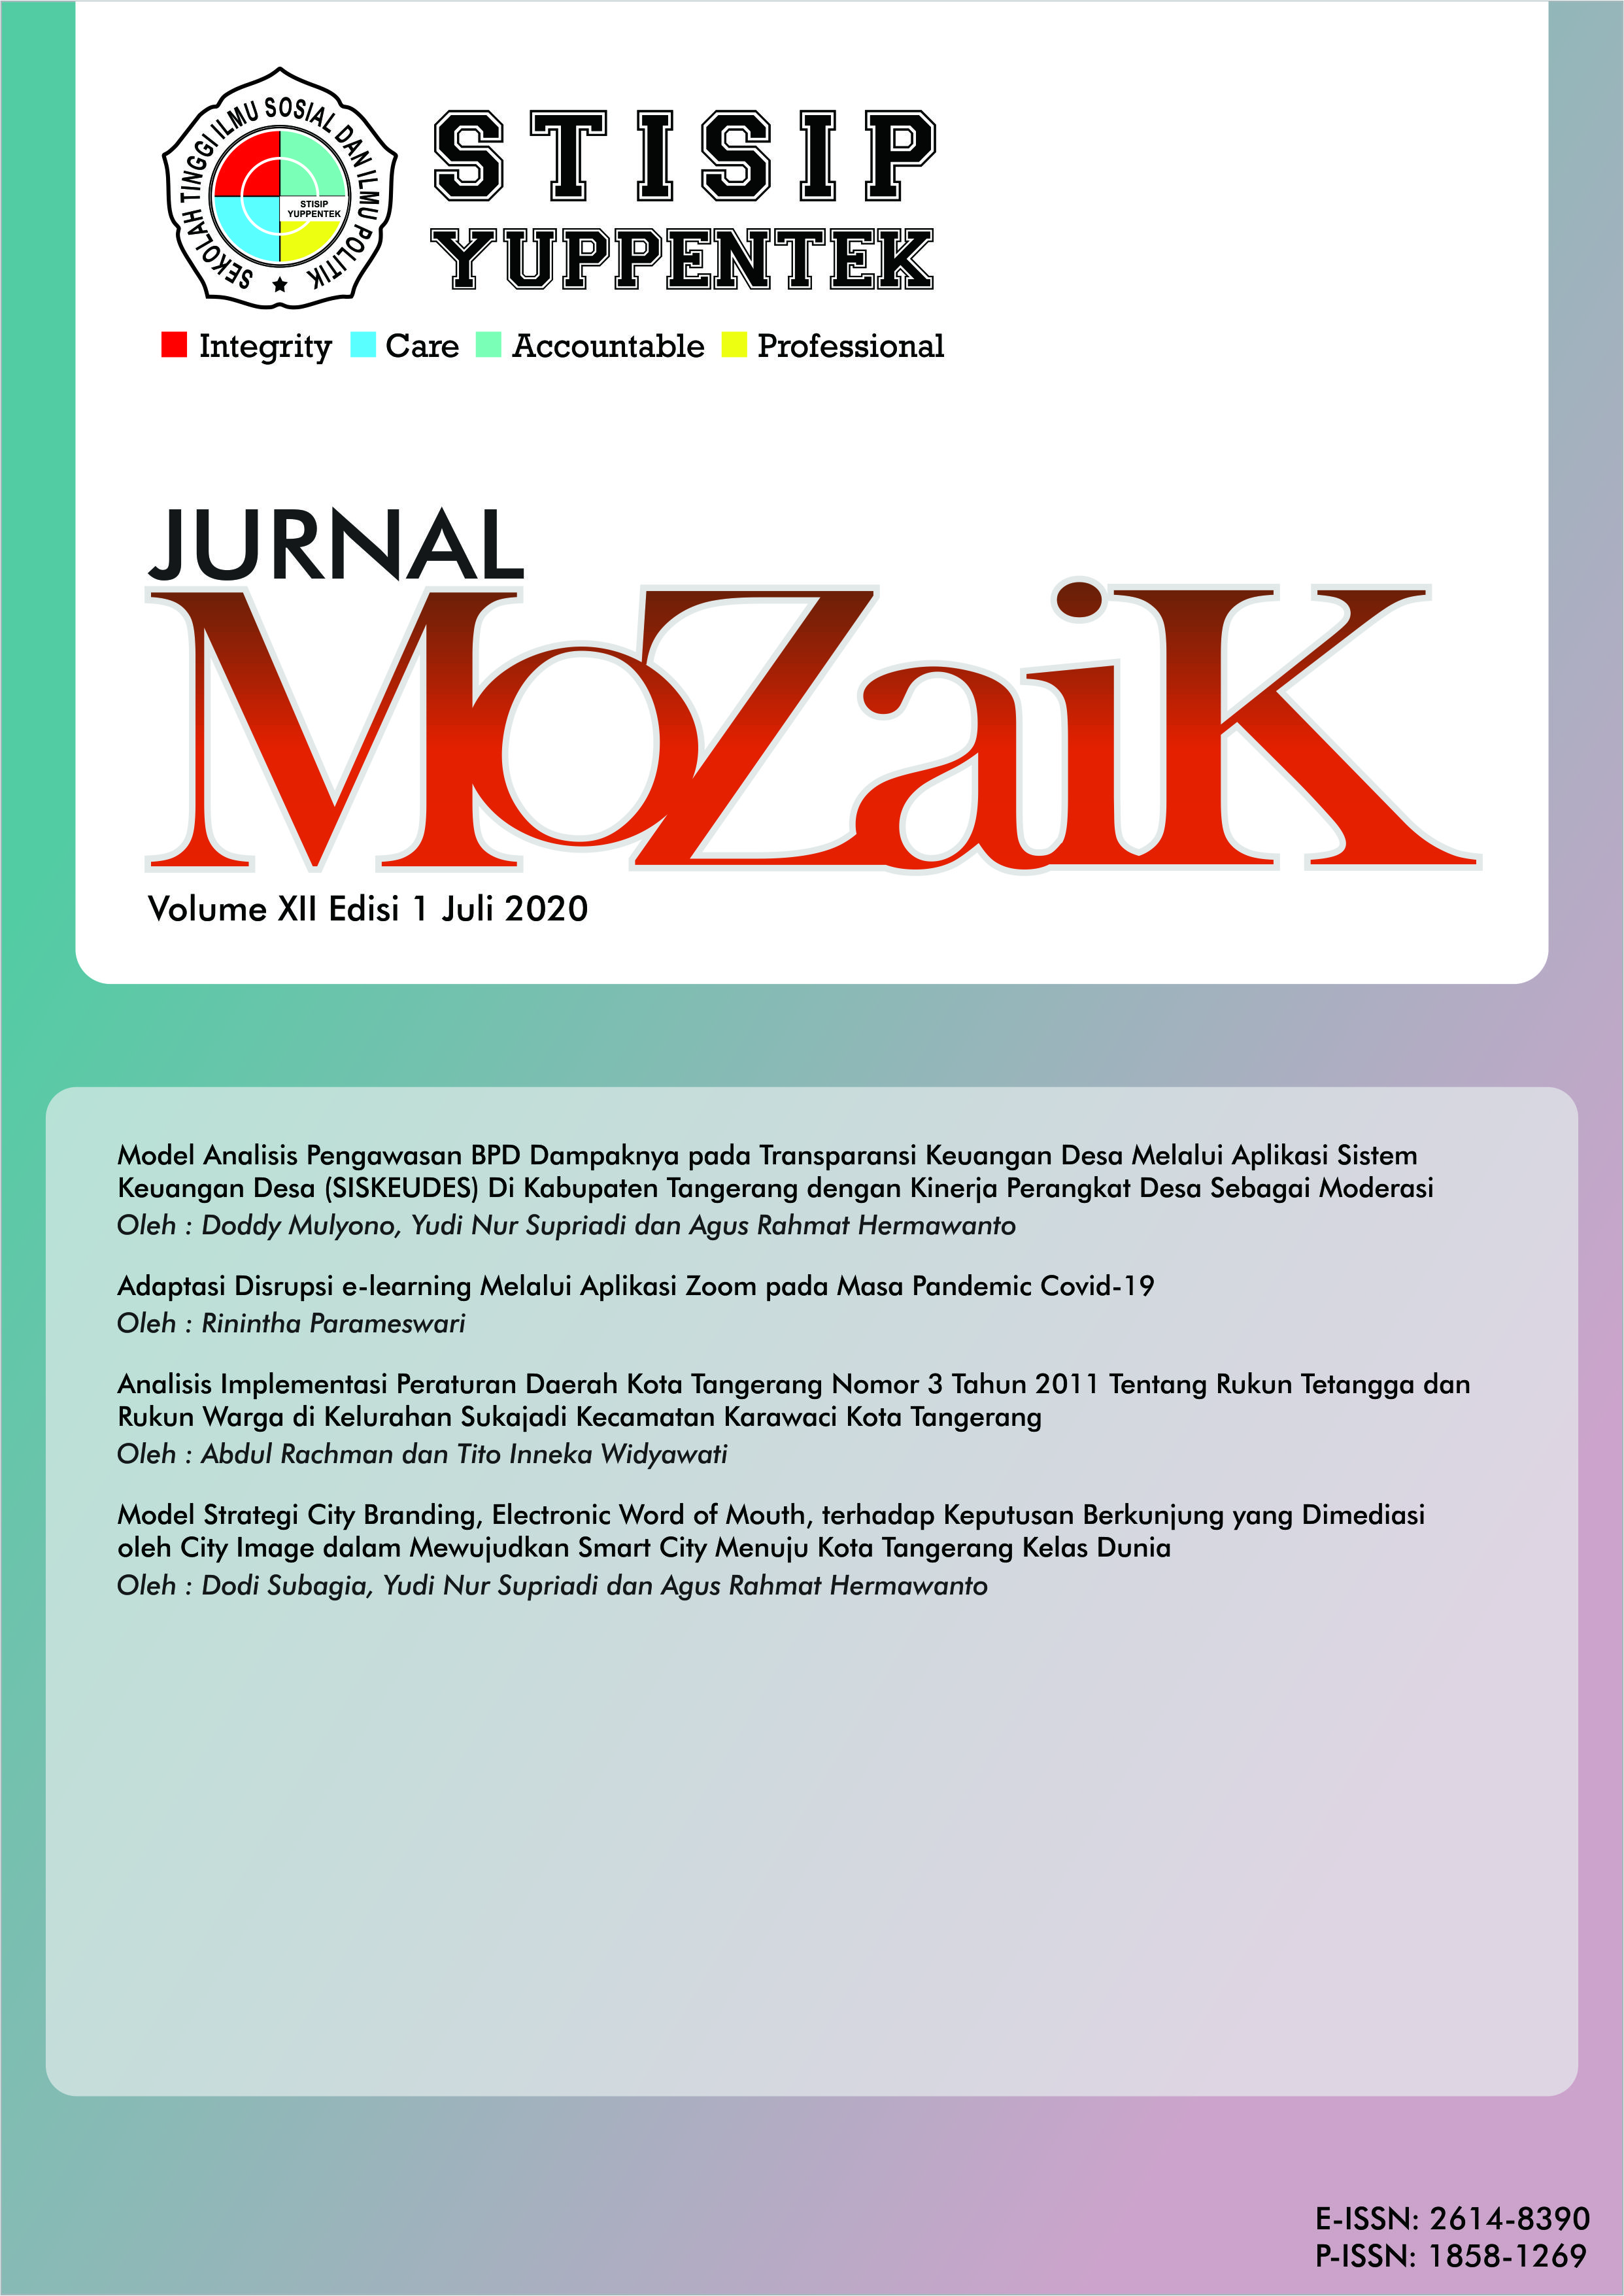 Lihat Vol 12 No 1 (2020): Jurnal Mozaik